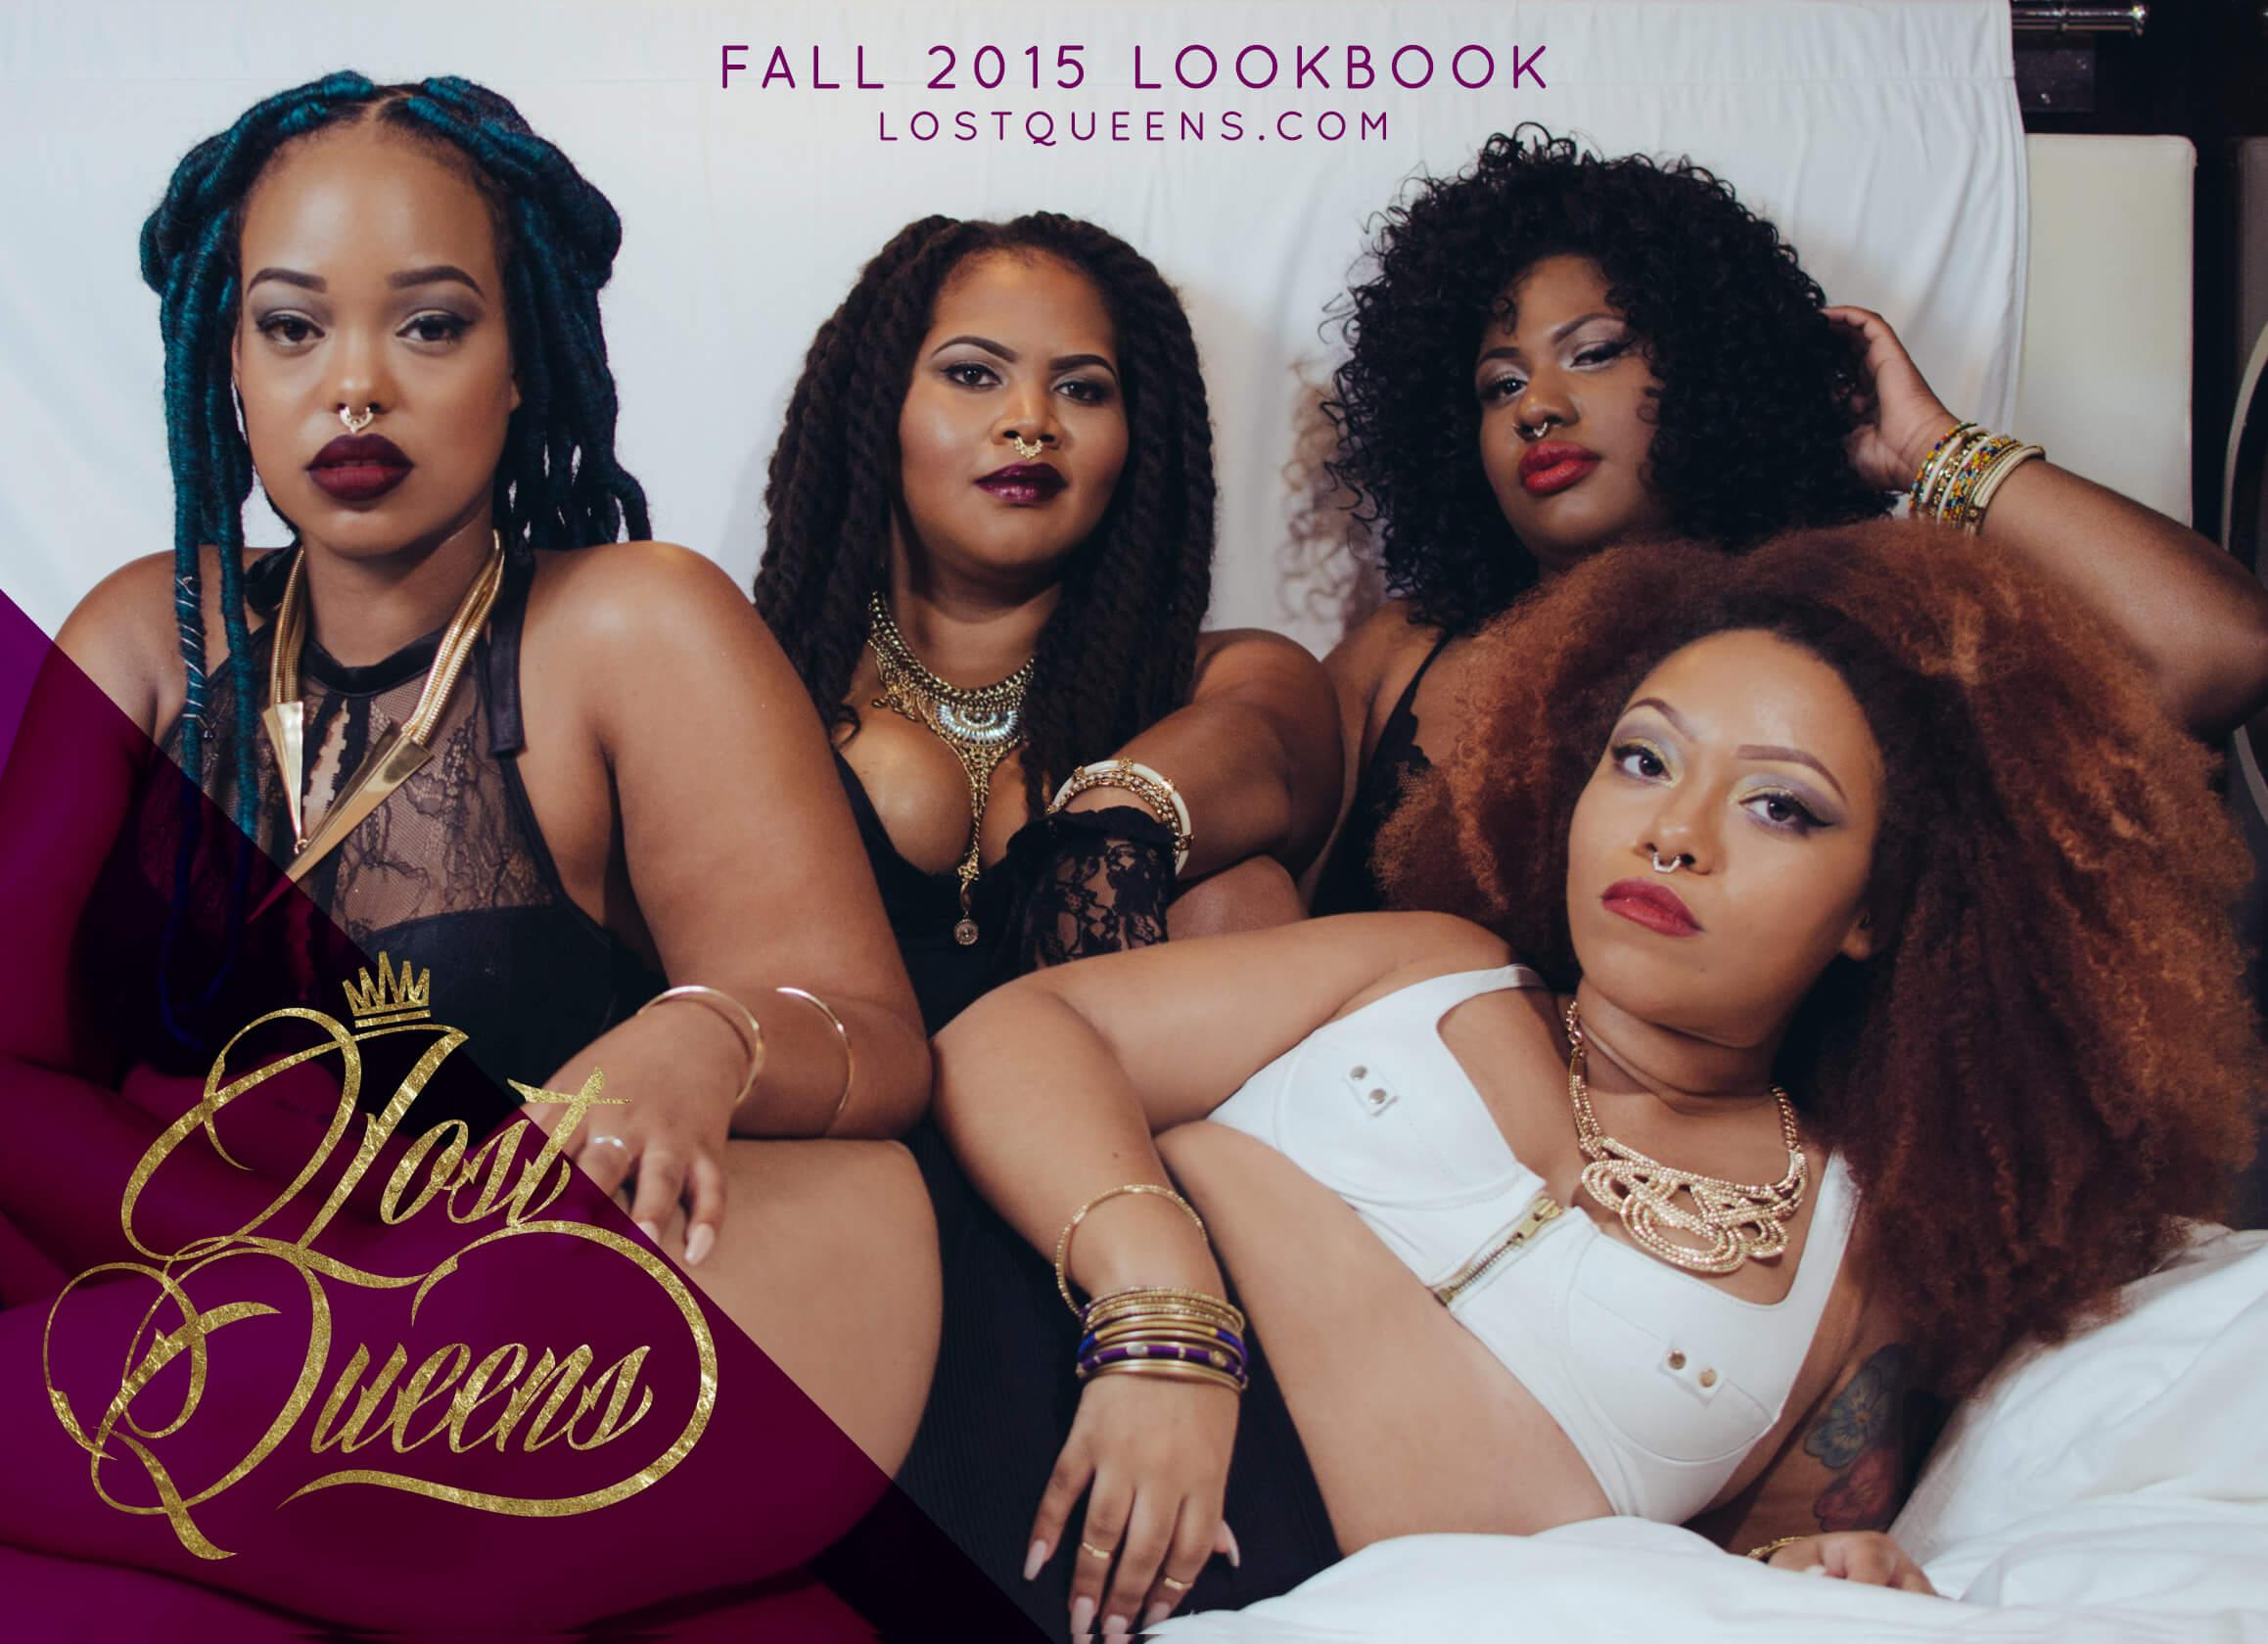 Lost Queens Fall '15 Campaign Lookbook